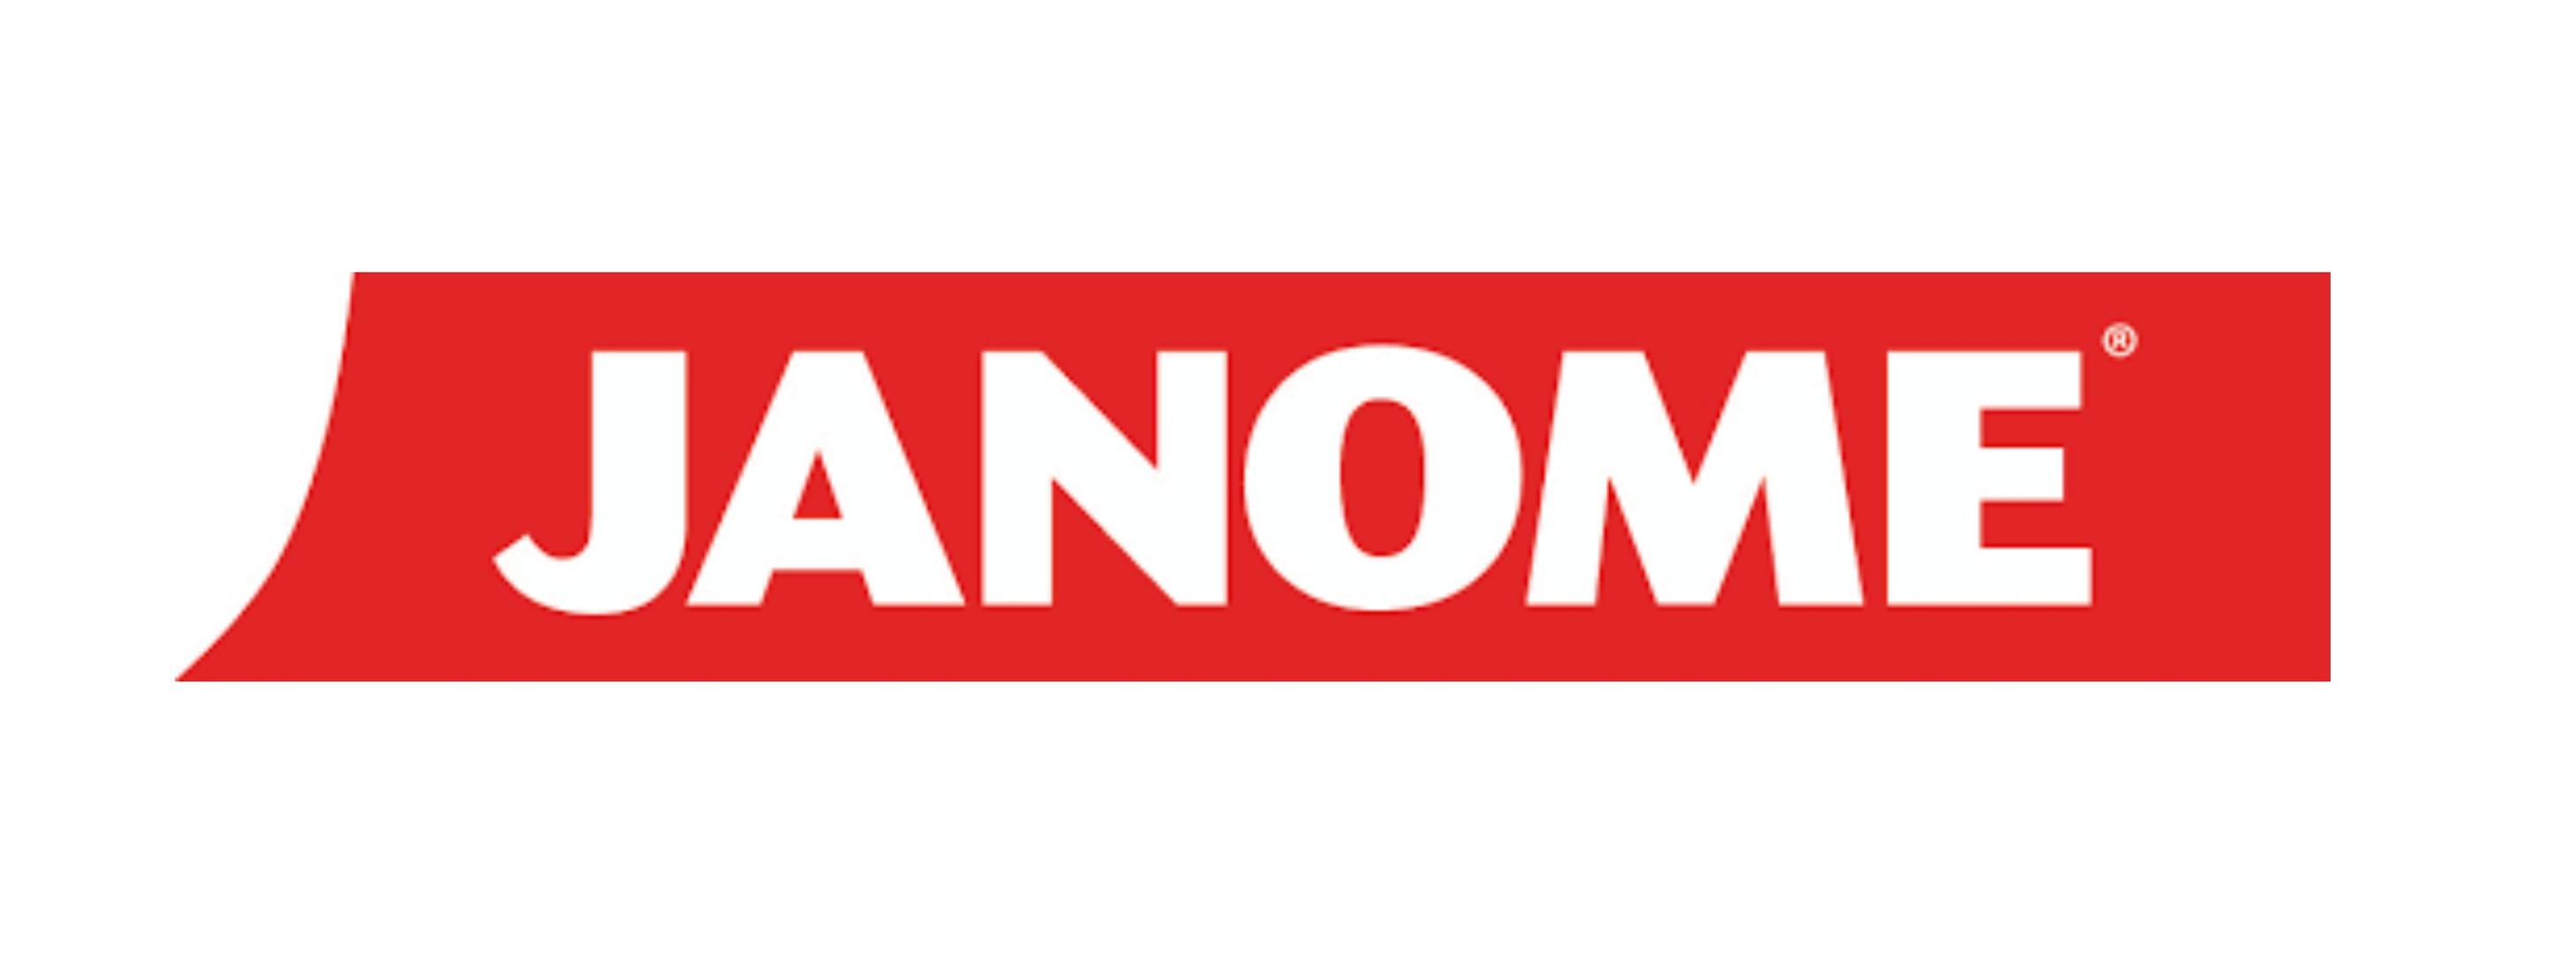 janome logo.jpg